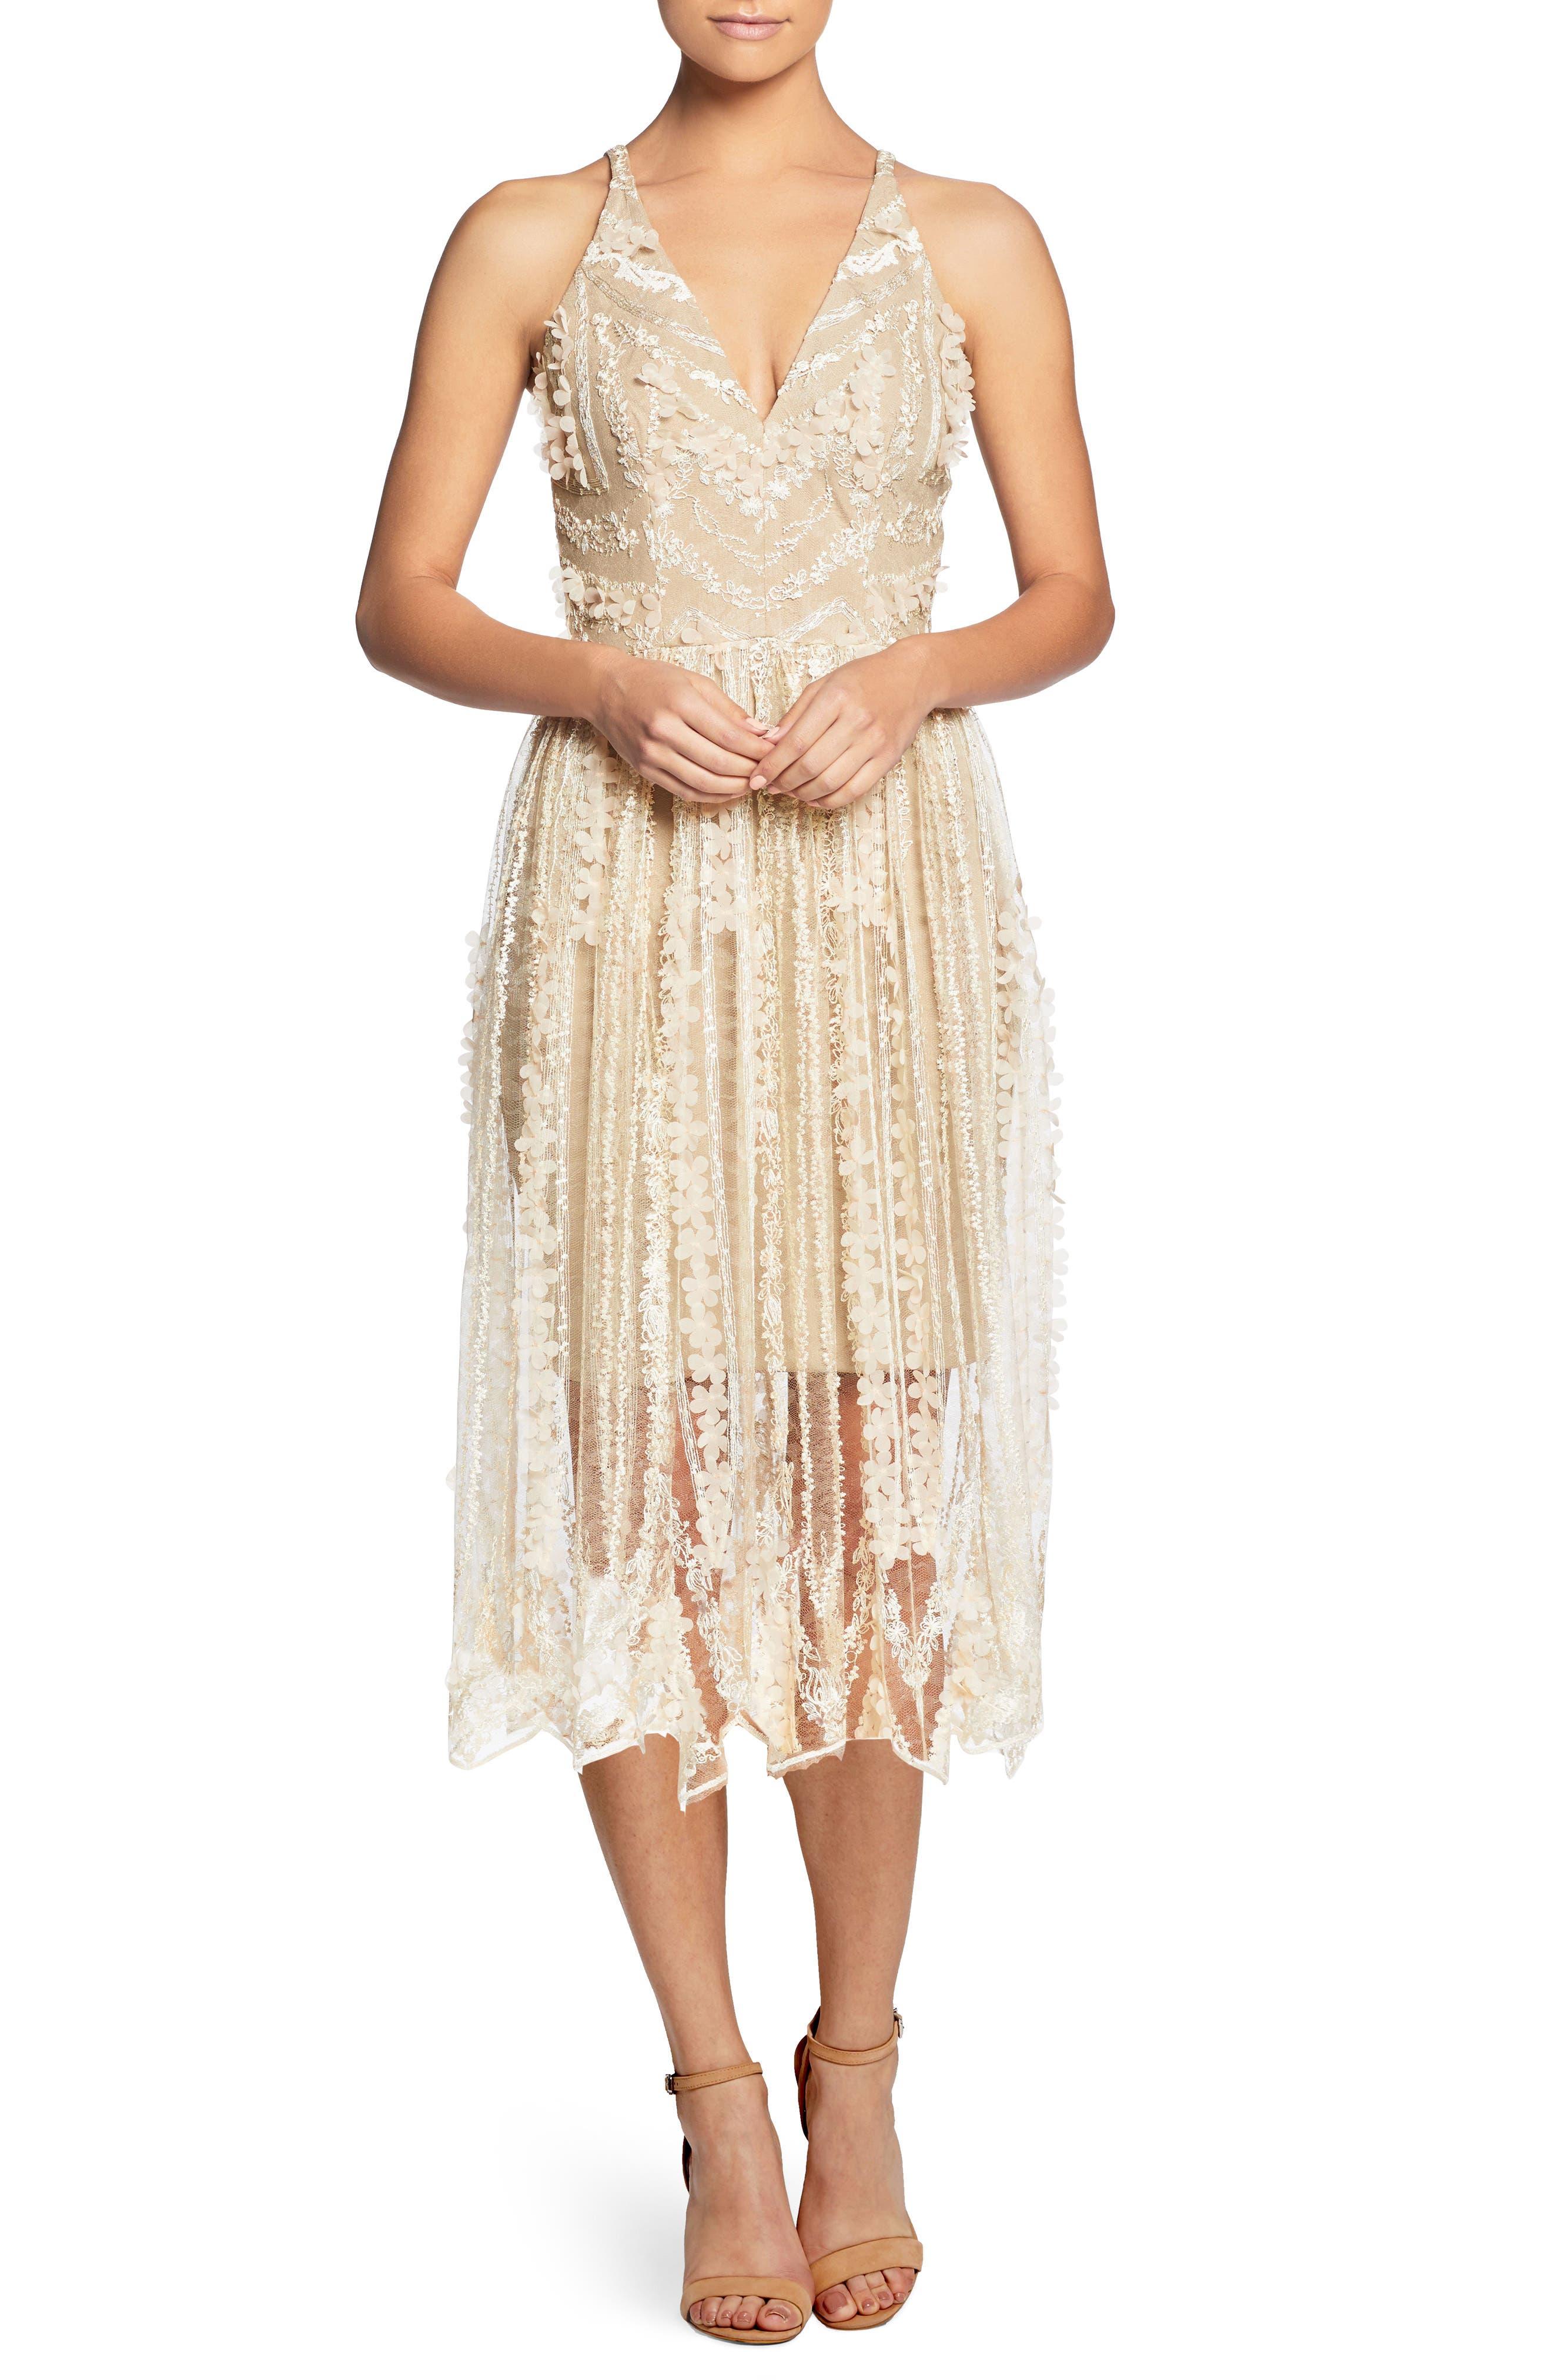 CELINE EMBROIDERED TEA LENGTH DRESS